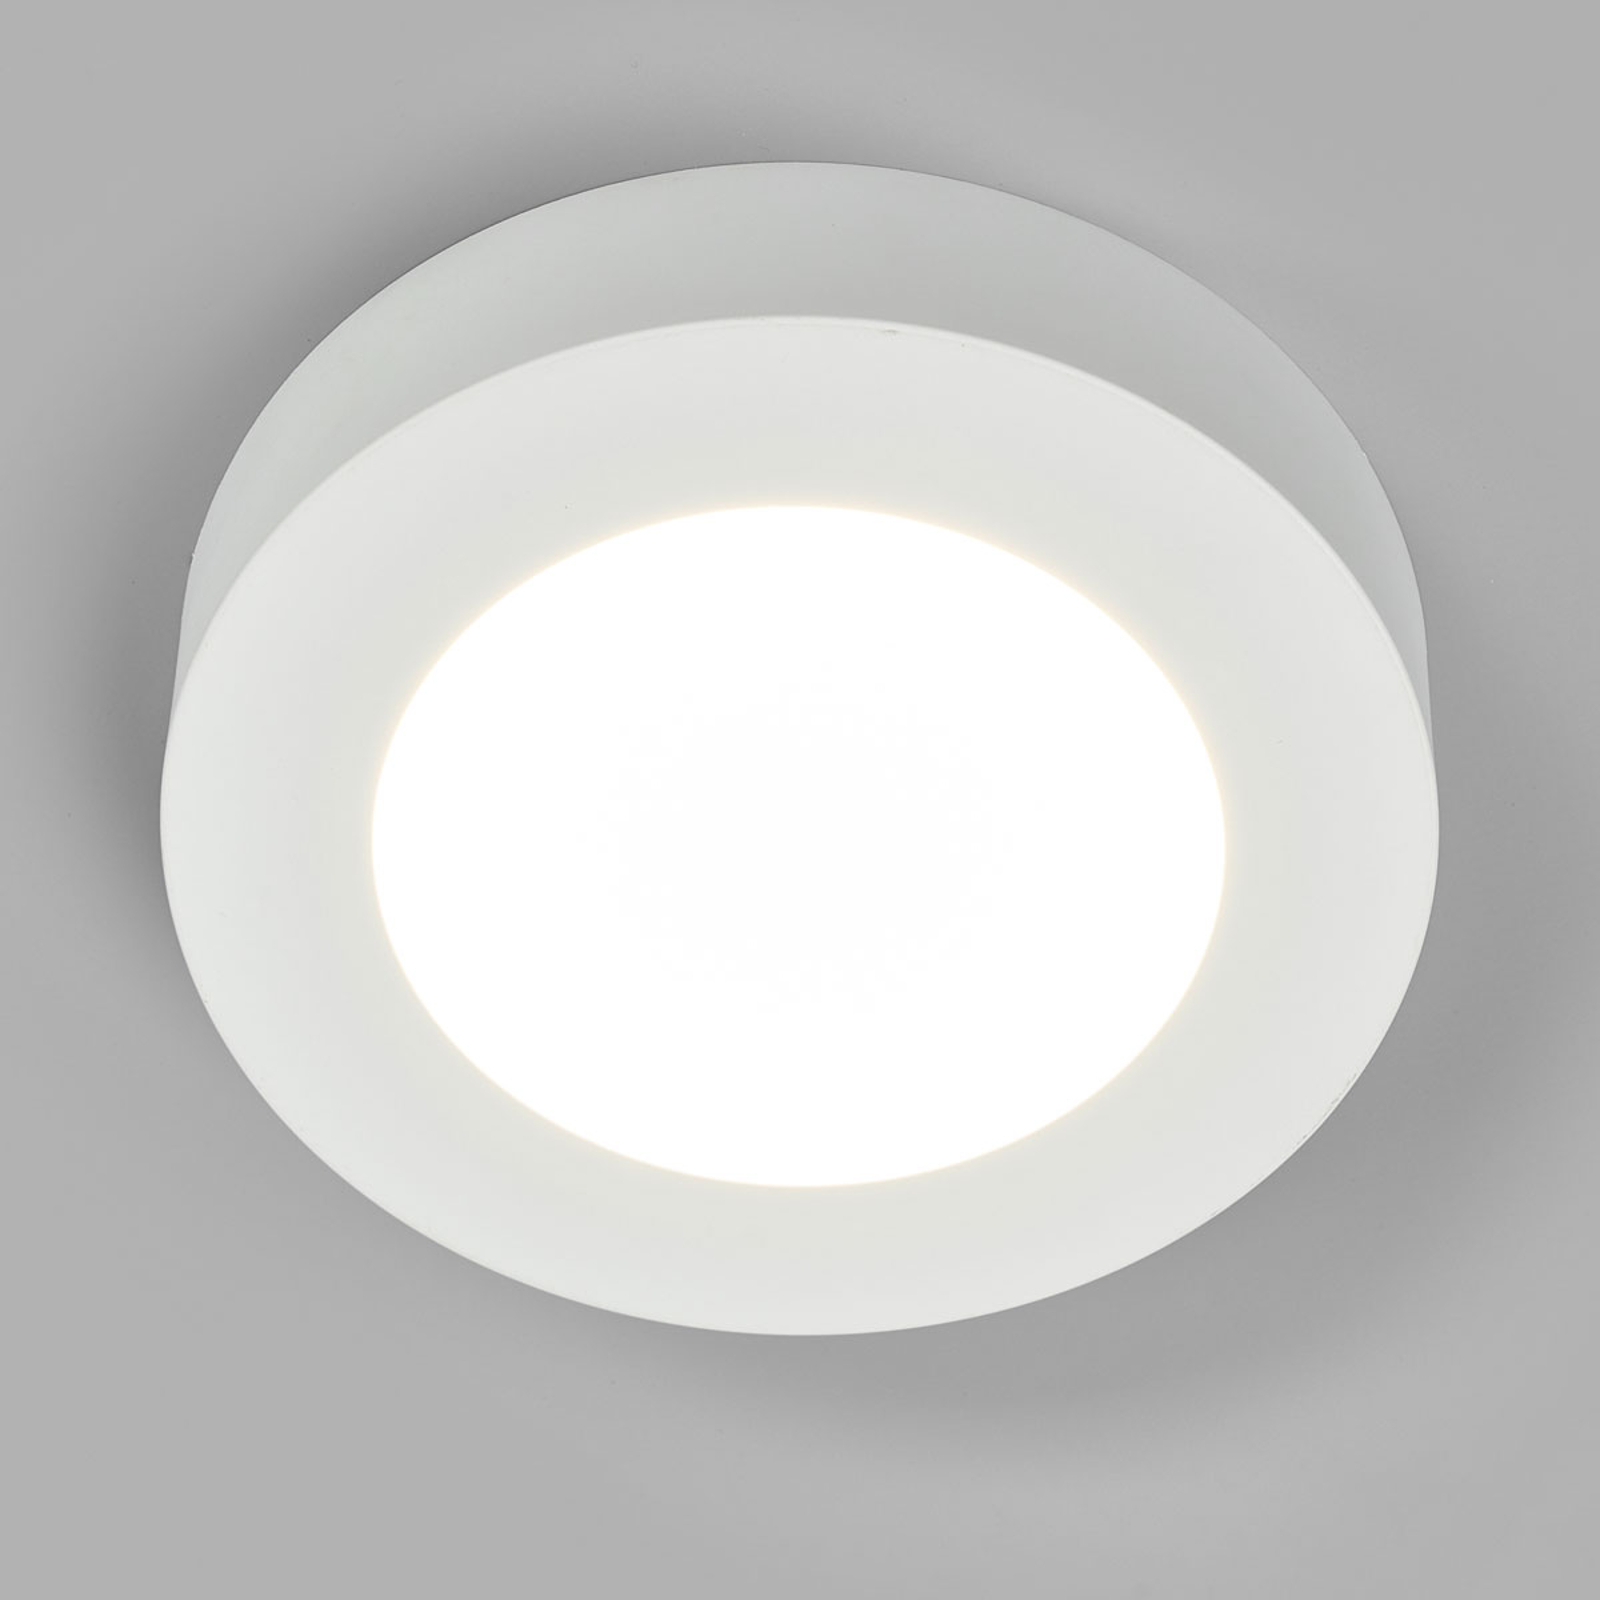 LED-loftlampe Marlo hvid 4000K rund 18,2cm